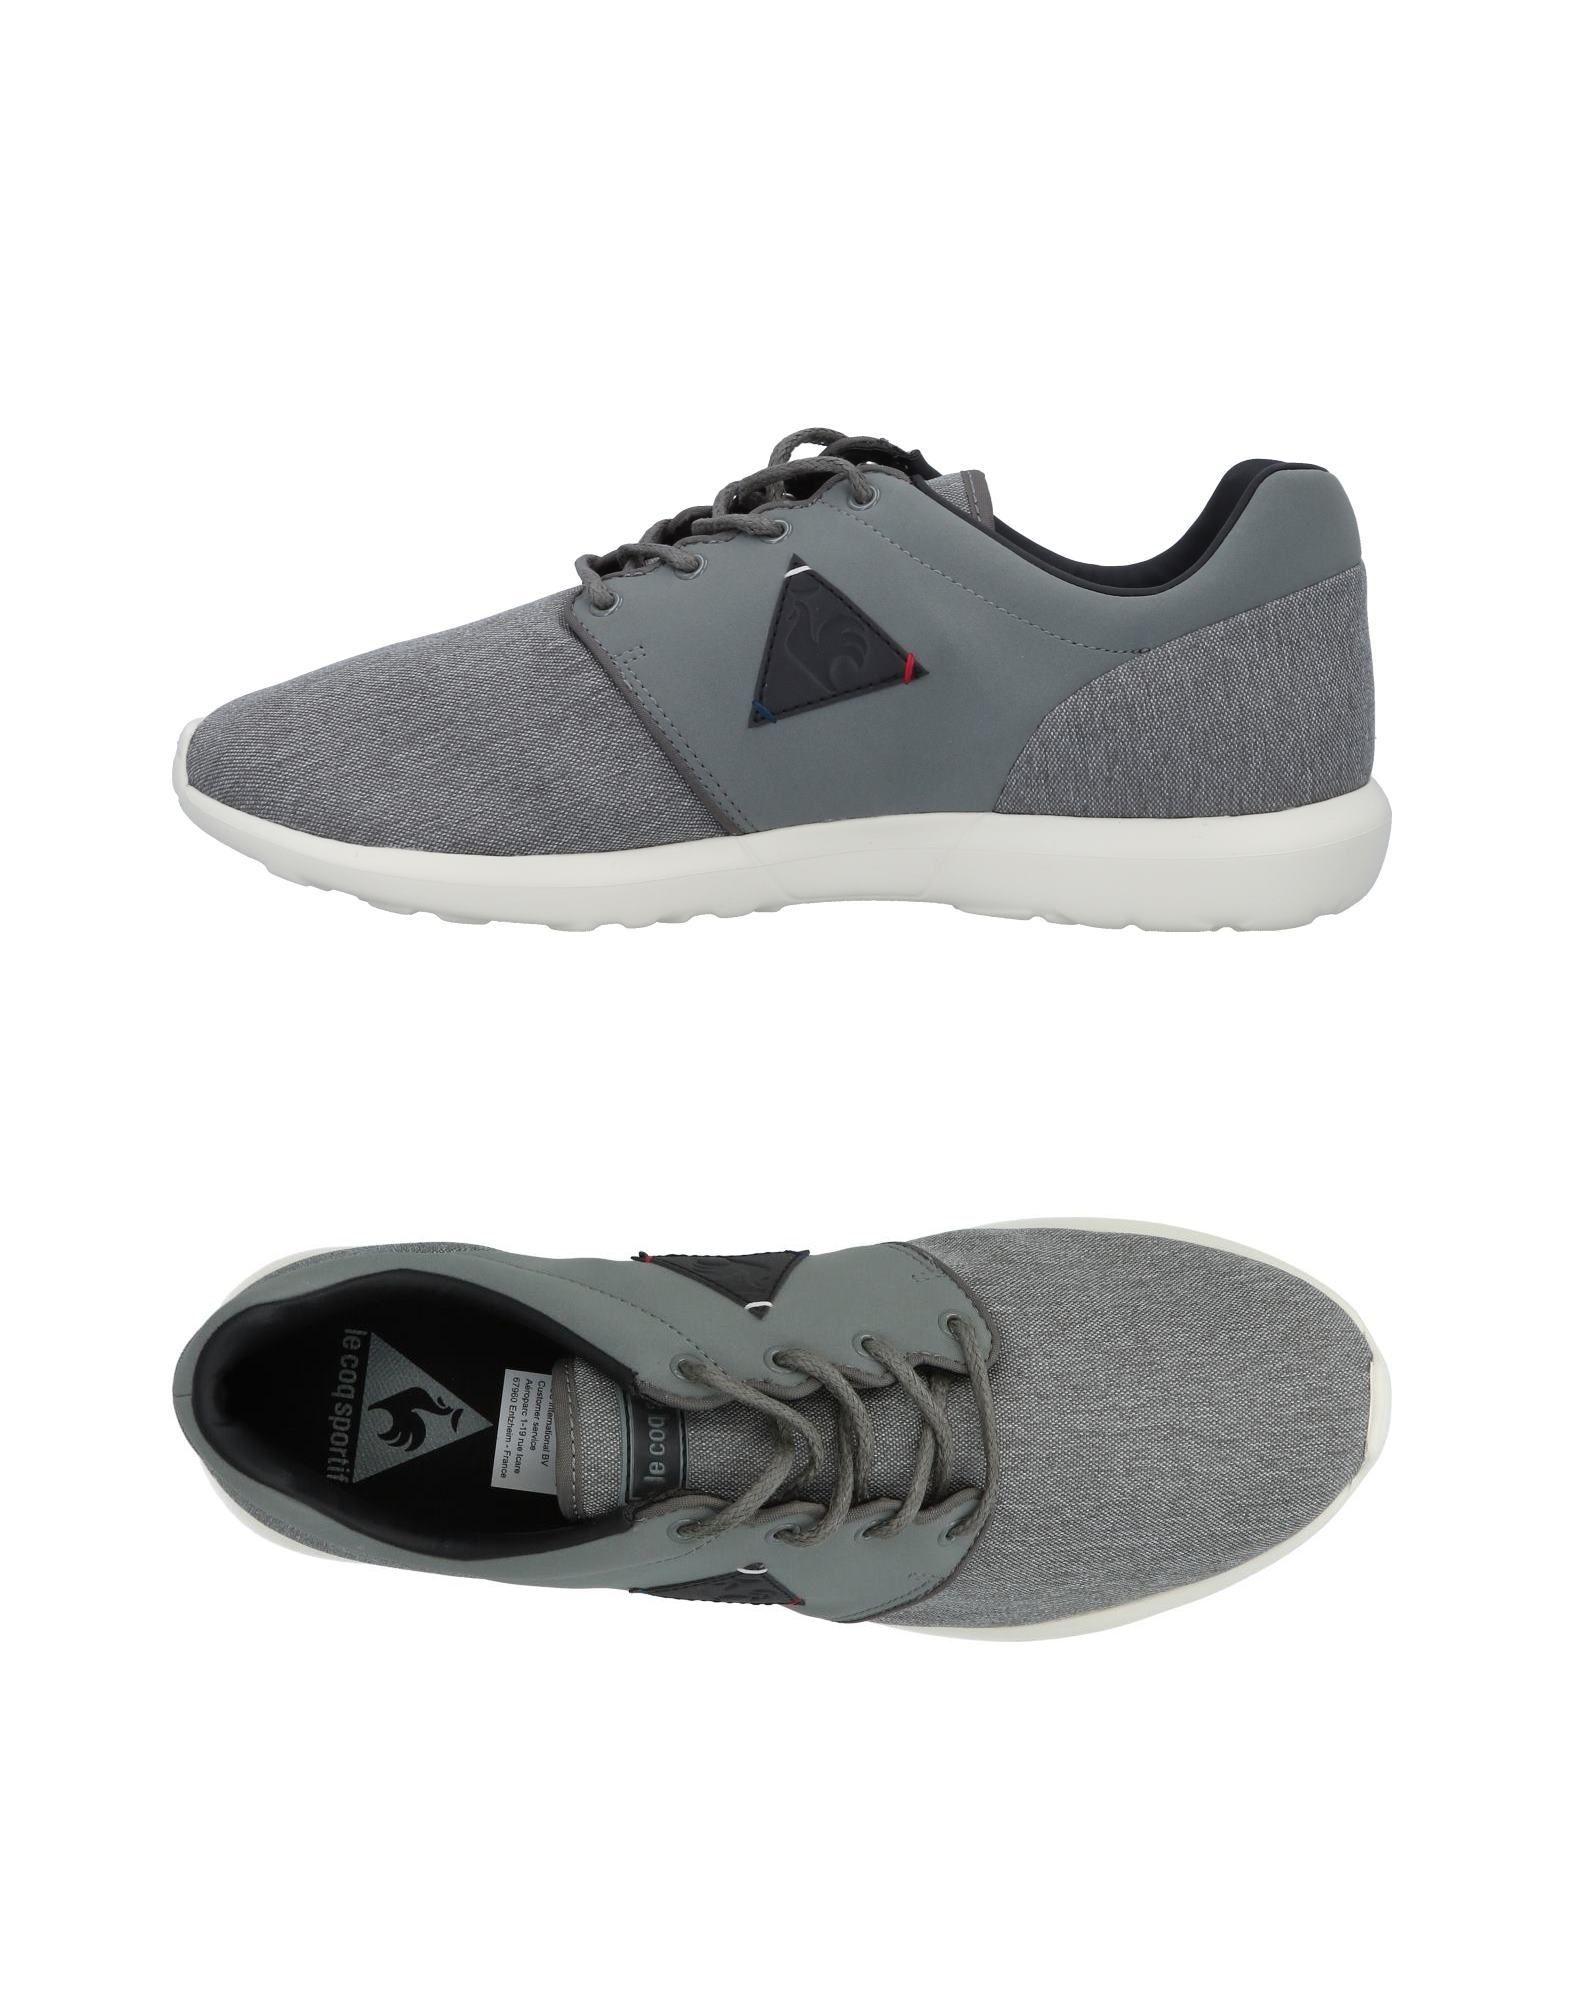 Rabatt echte Schuhe Le Coq Sportif Sneakers Herren  11497410WN